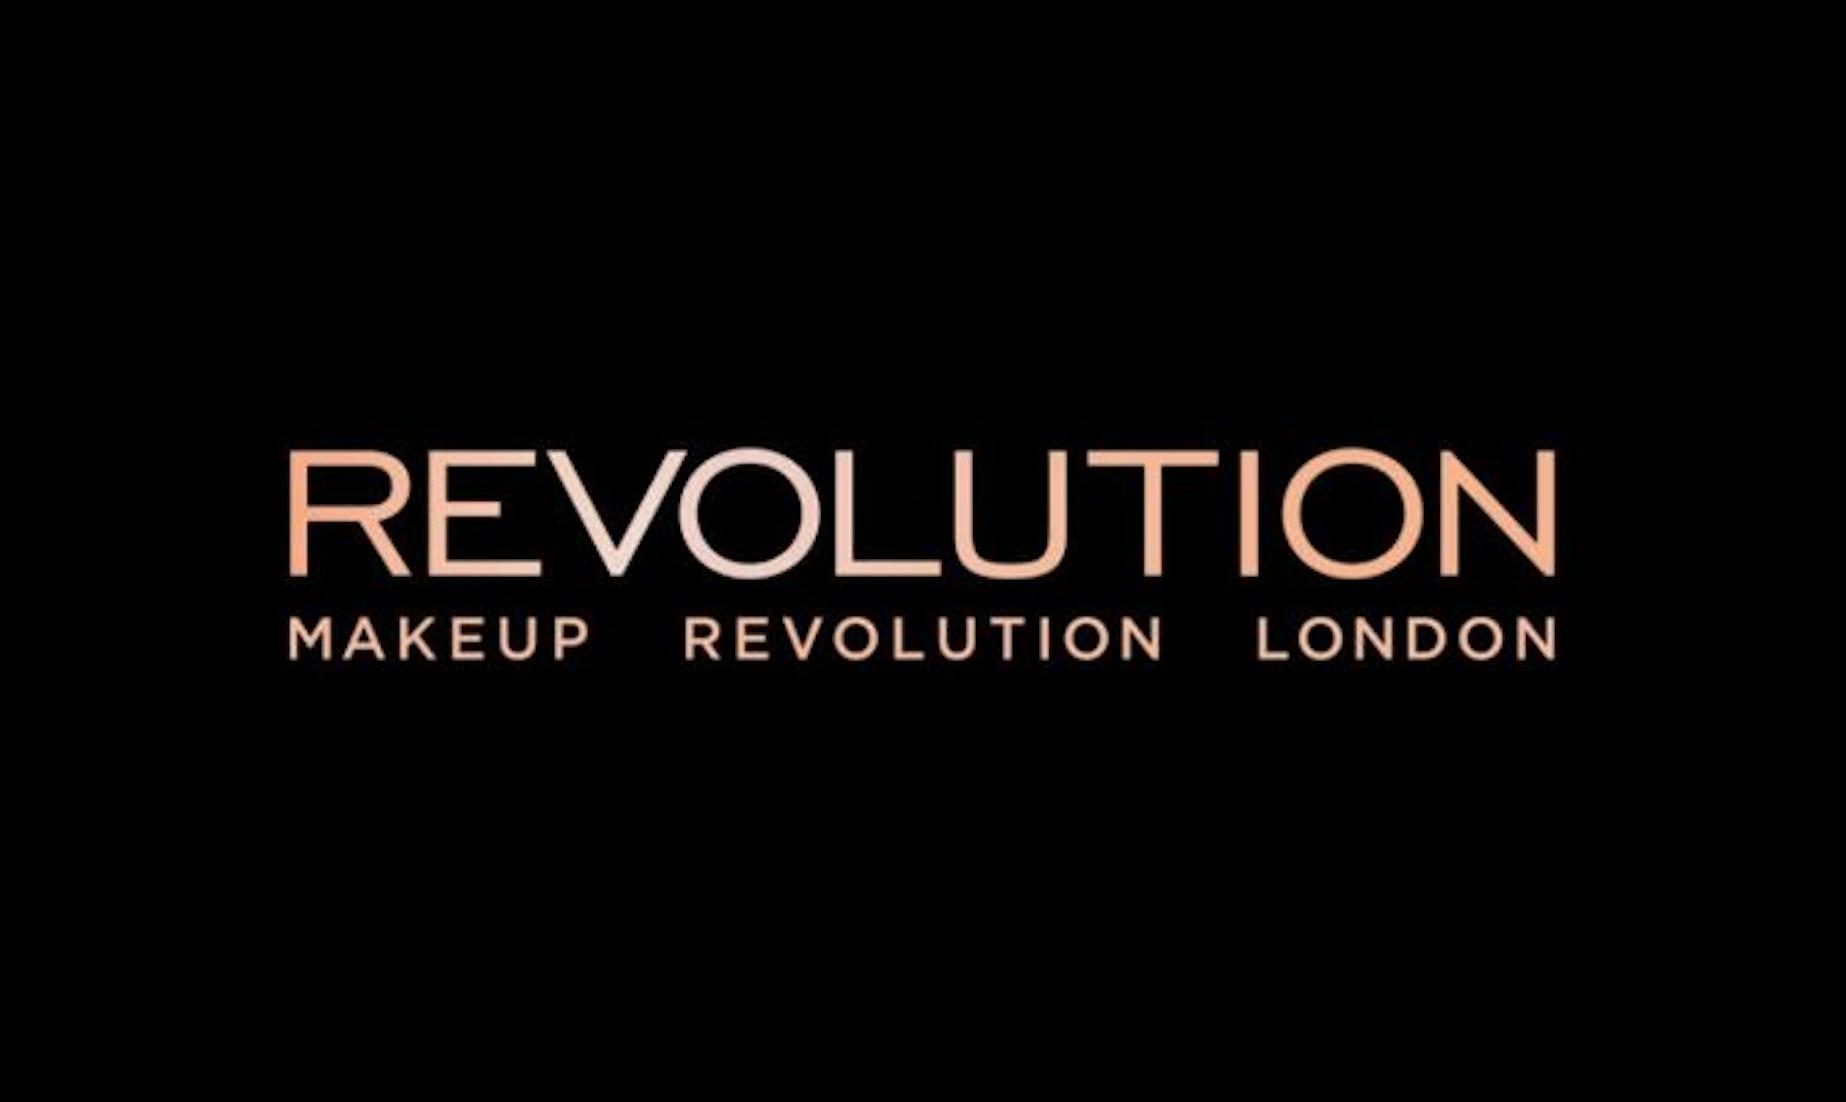 makeup-revolution-london-logo.jpg